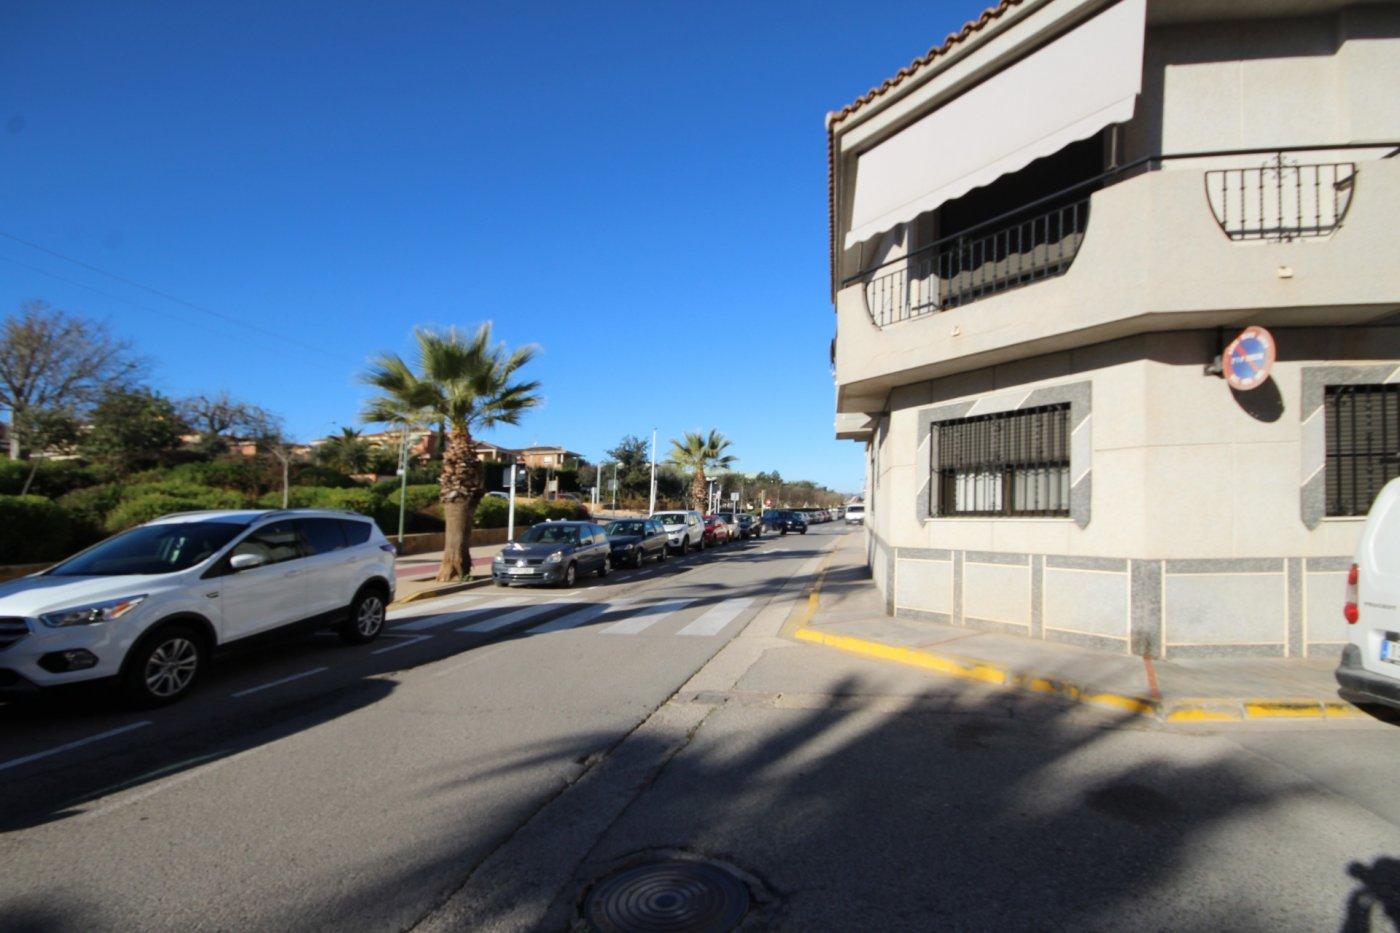 Car parking  Riba - roja de turia ,la malla. Plaza de garaje con trastero en ribarroja